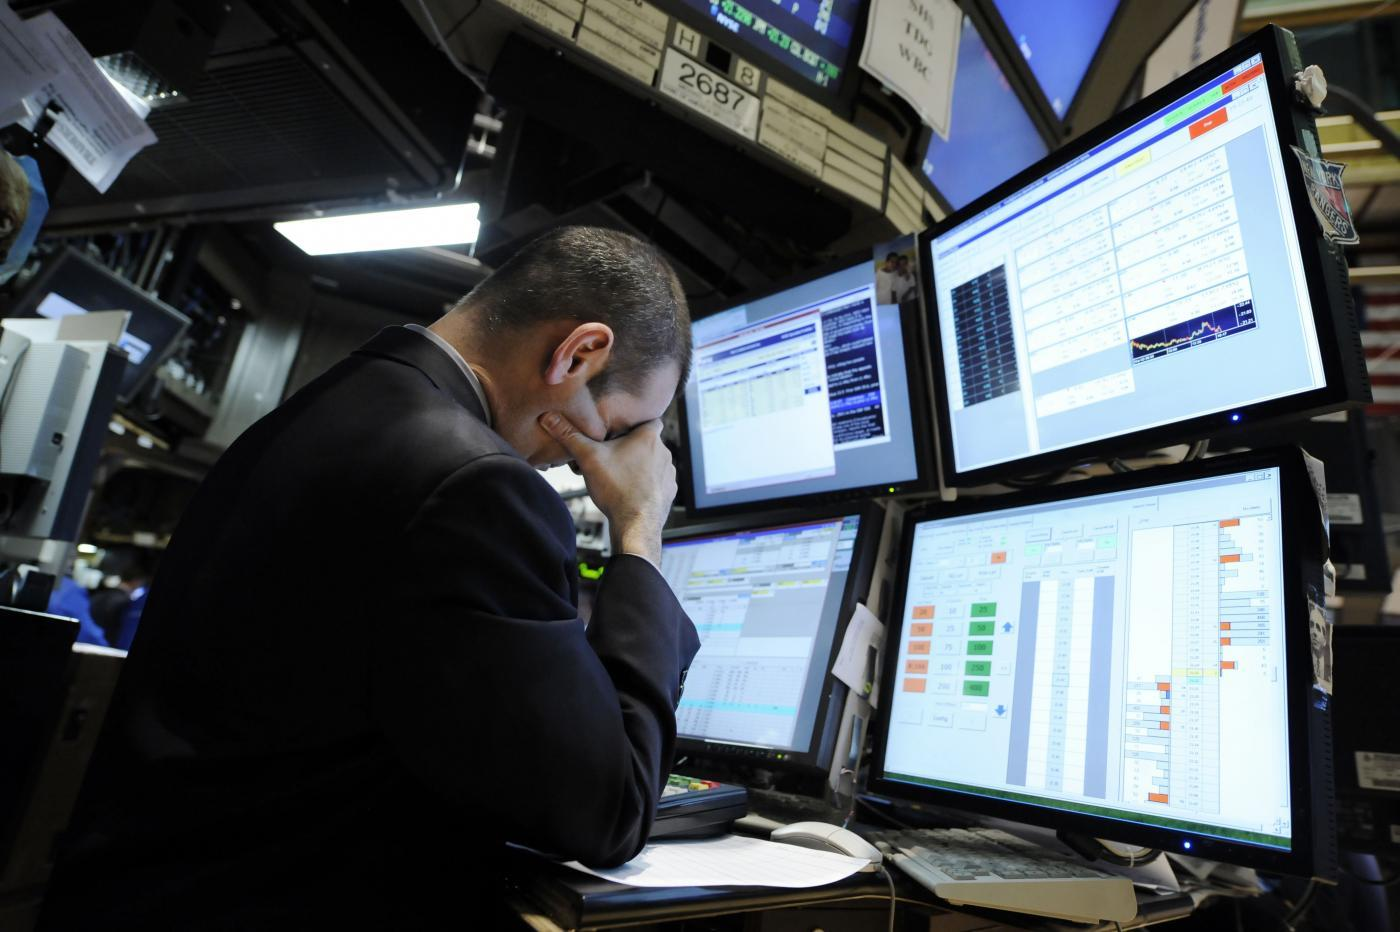 mercati_finanza_borsa_crisi_bond_indici